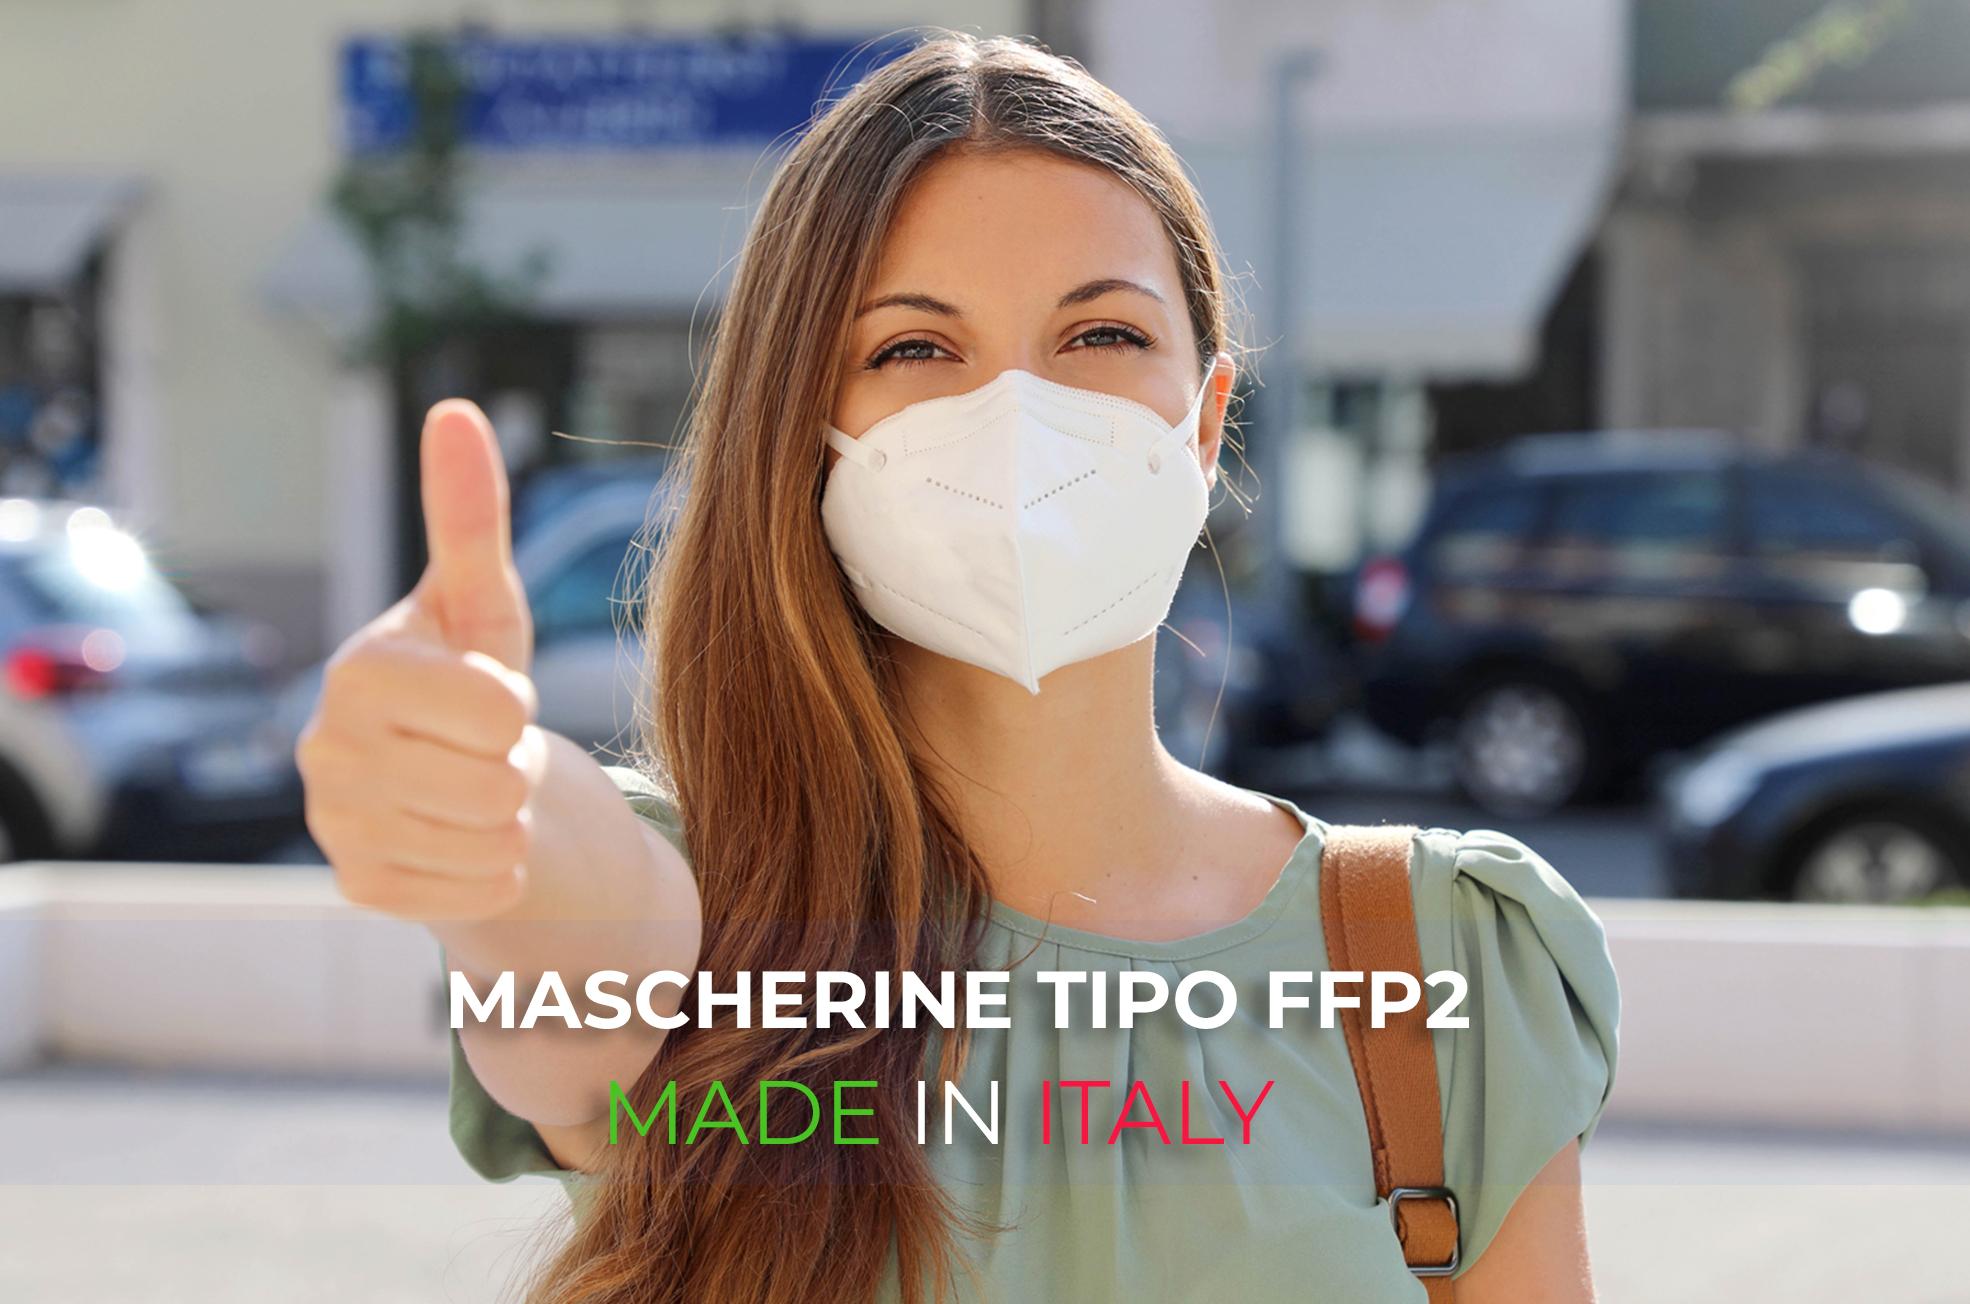 MASCHERINE-TIPOFFP2-COVID-MADEIN-ITALY